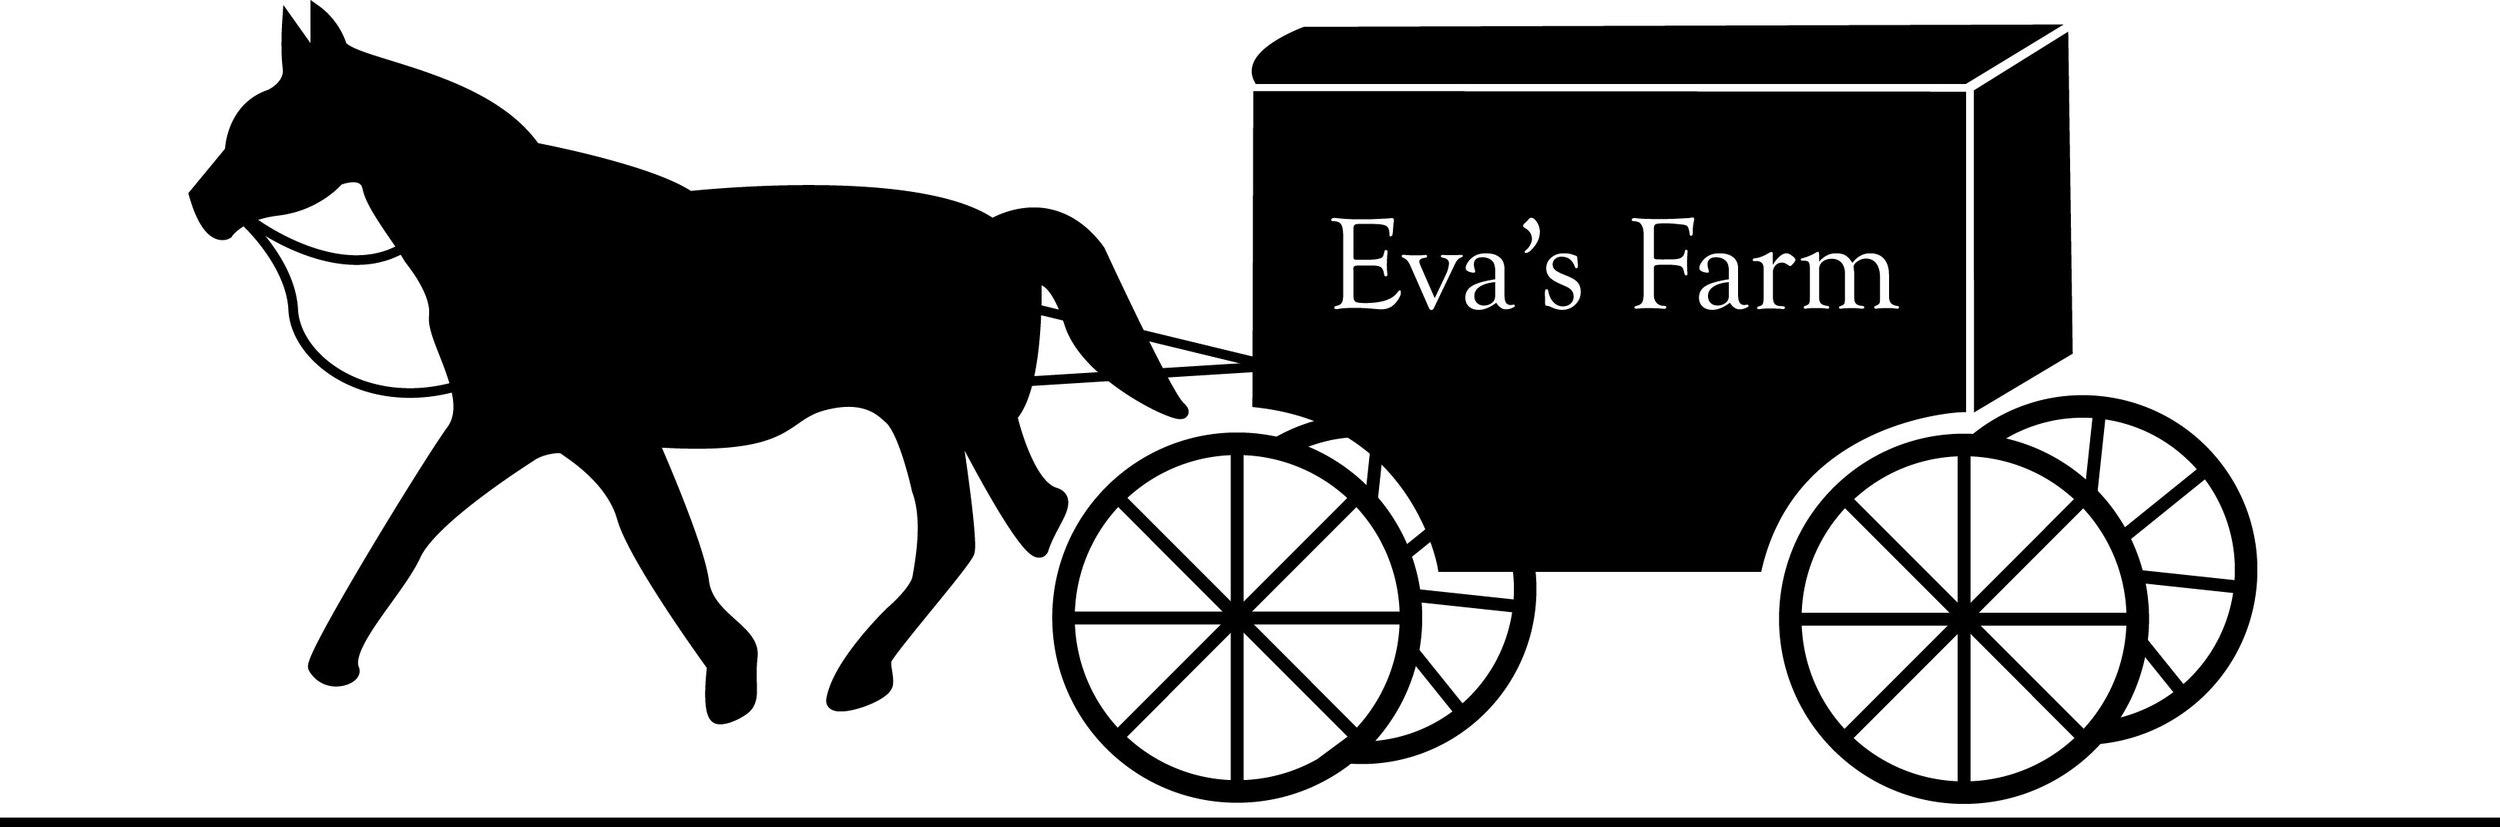 Eva's Farm Organic Butcher Shop Logo envelope.jpg